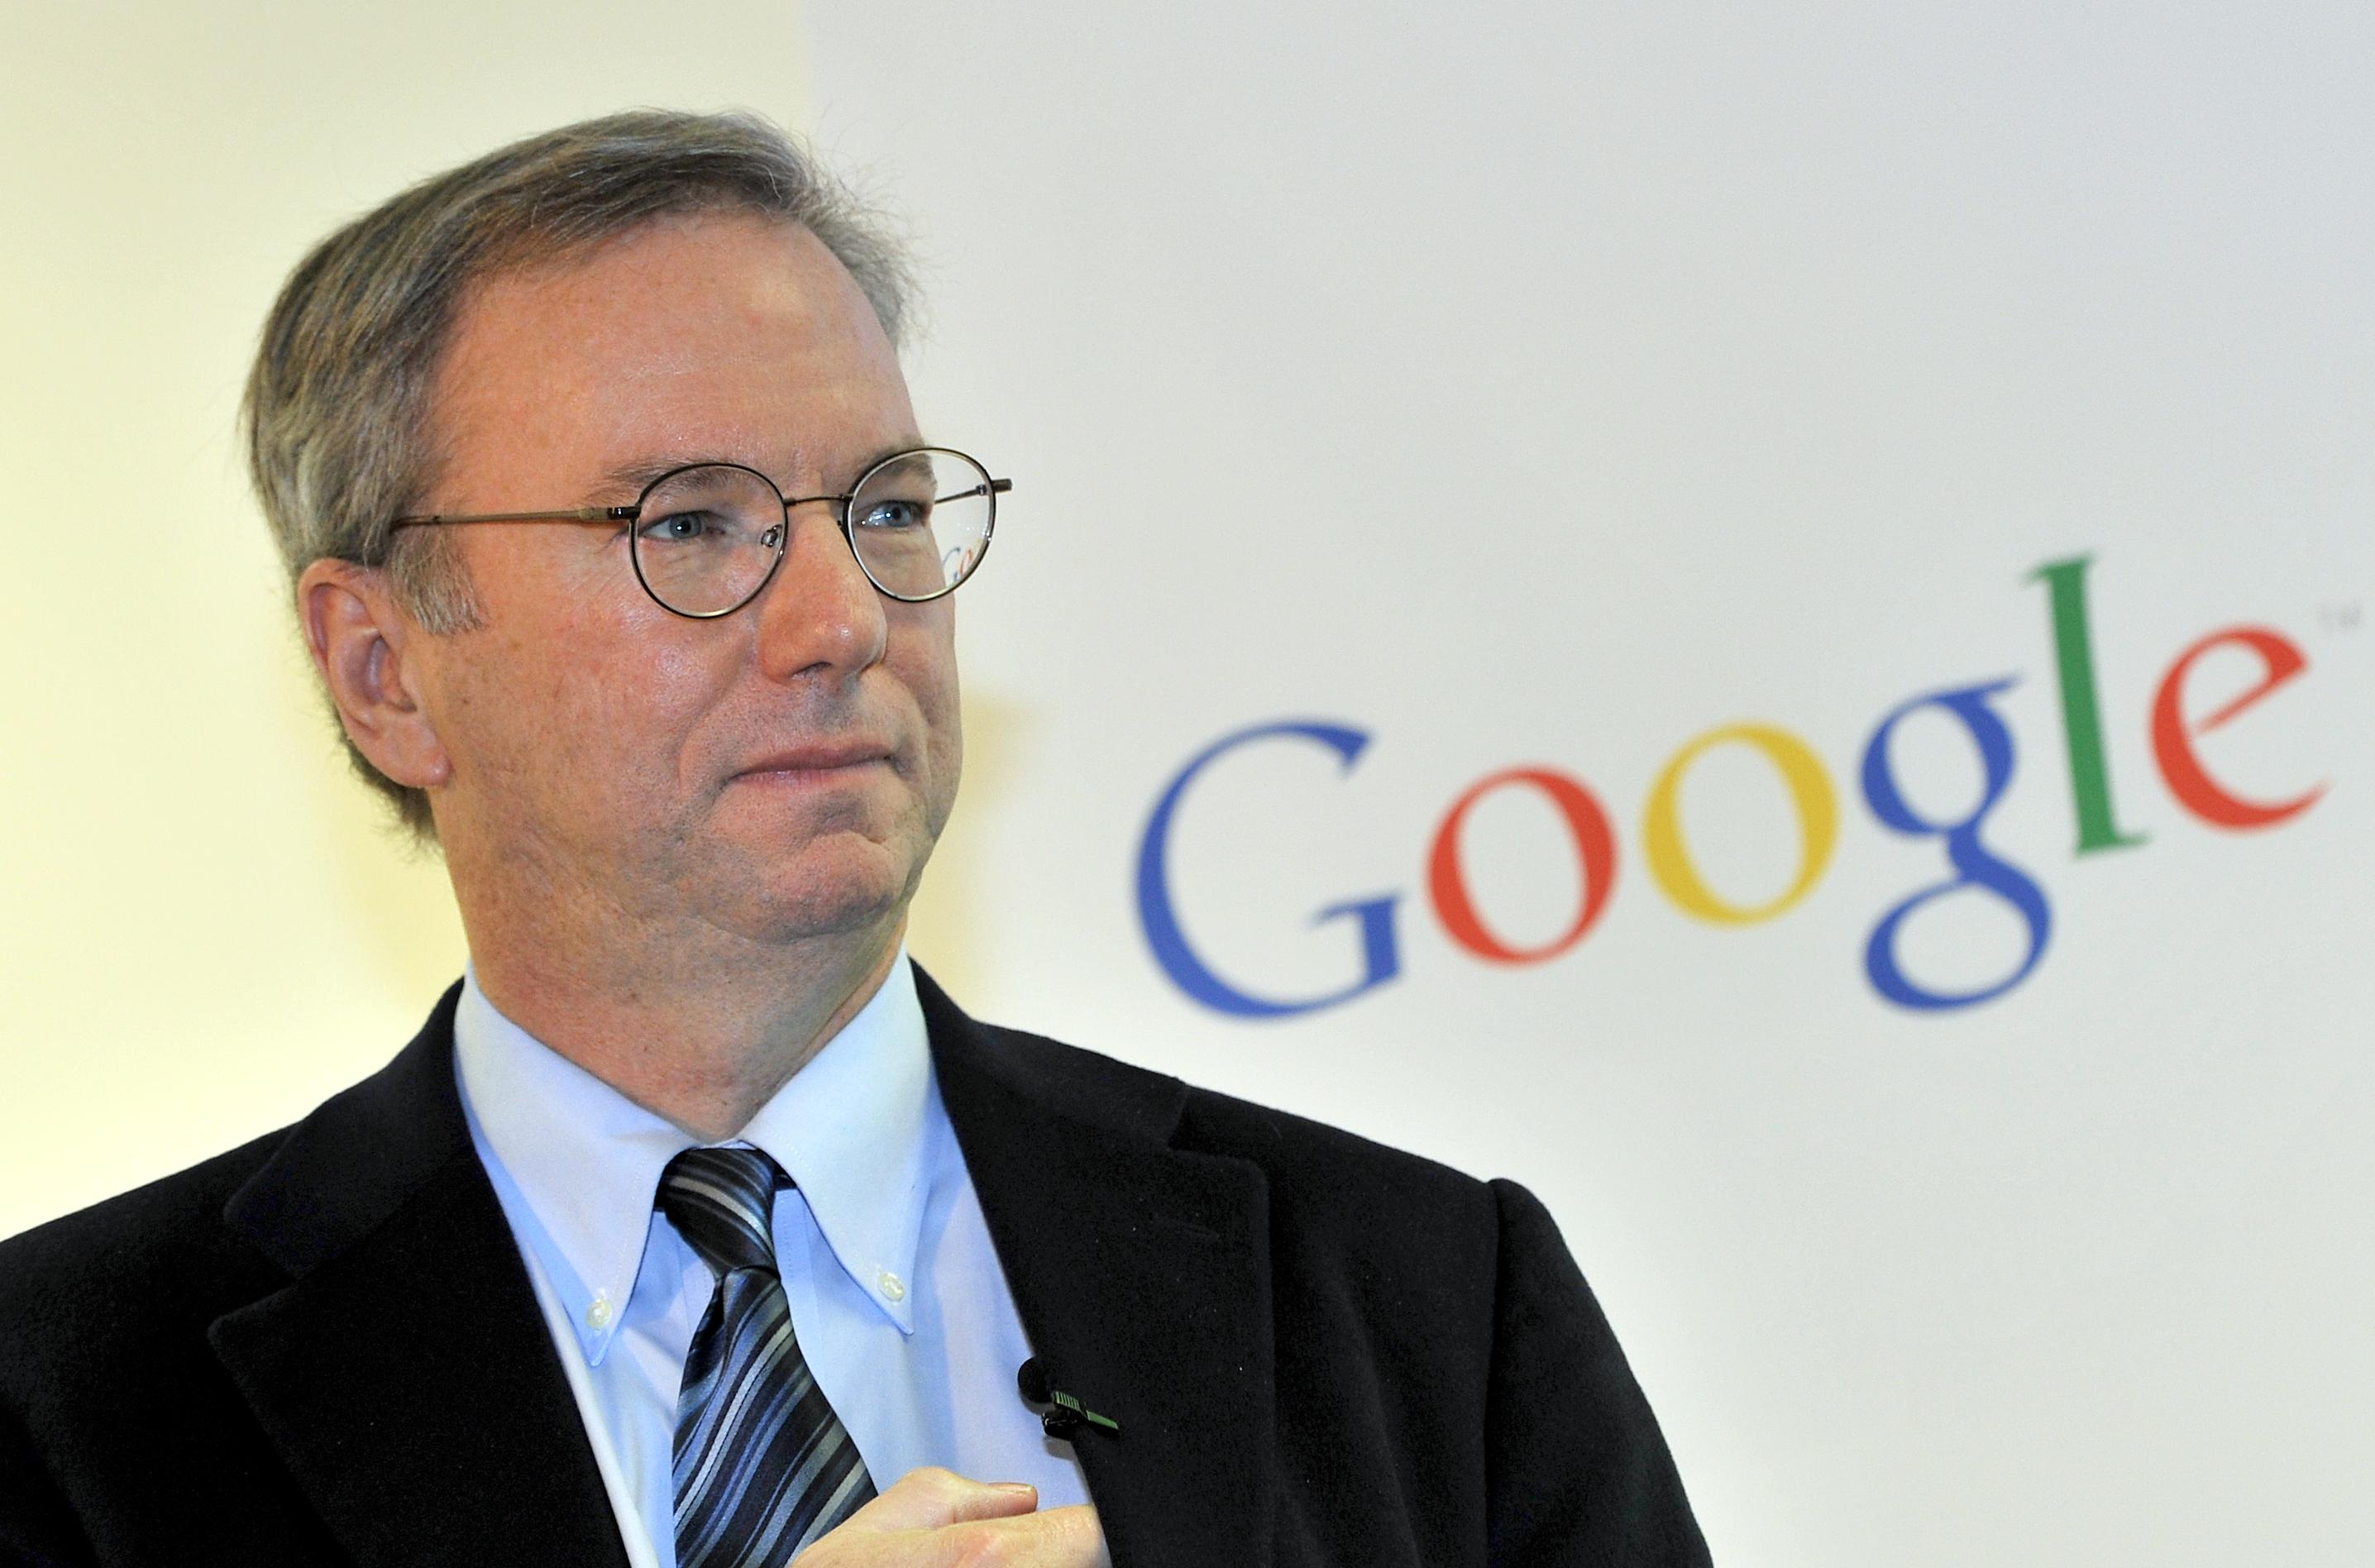 eric schmidt, eks chairman google, dont be evil, motto google, act consulting, makna bekerja di google